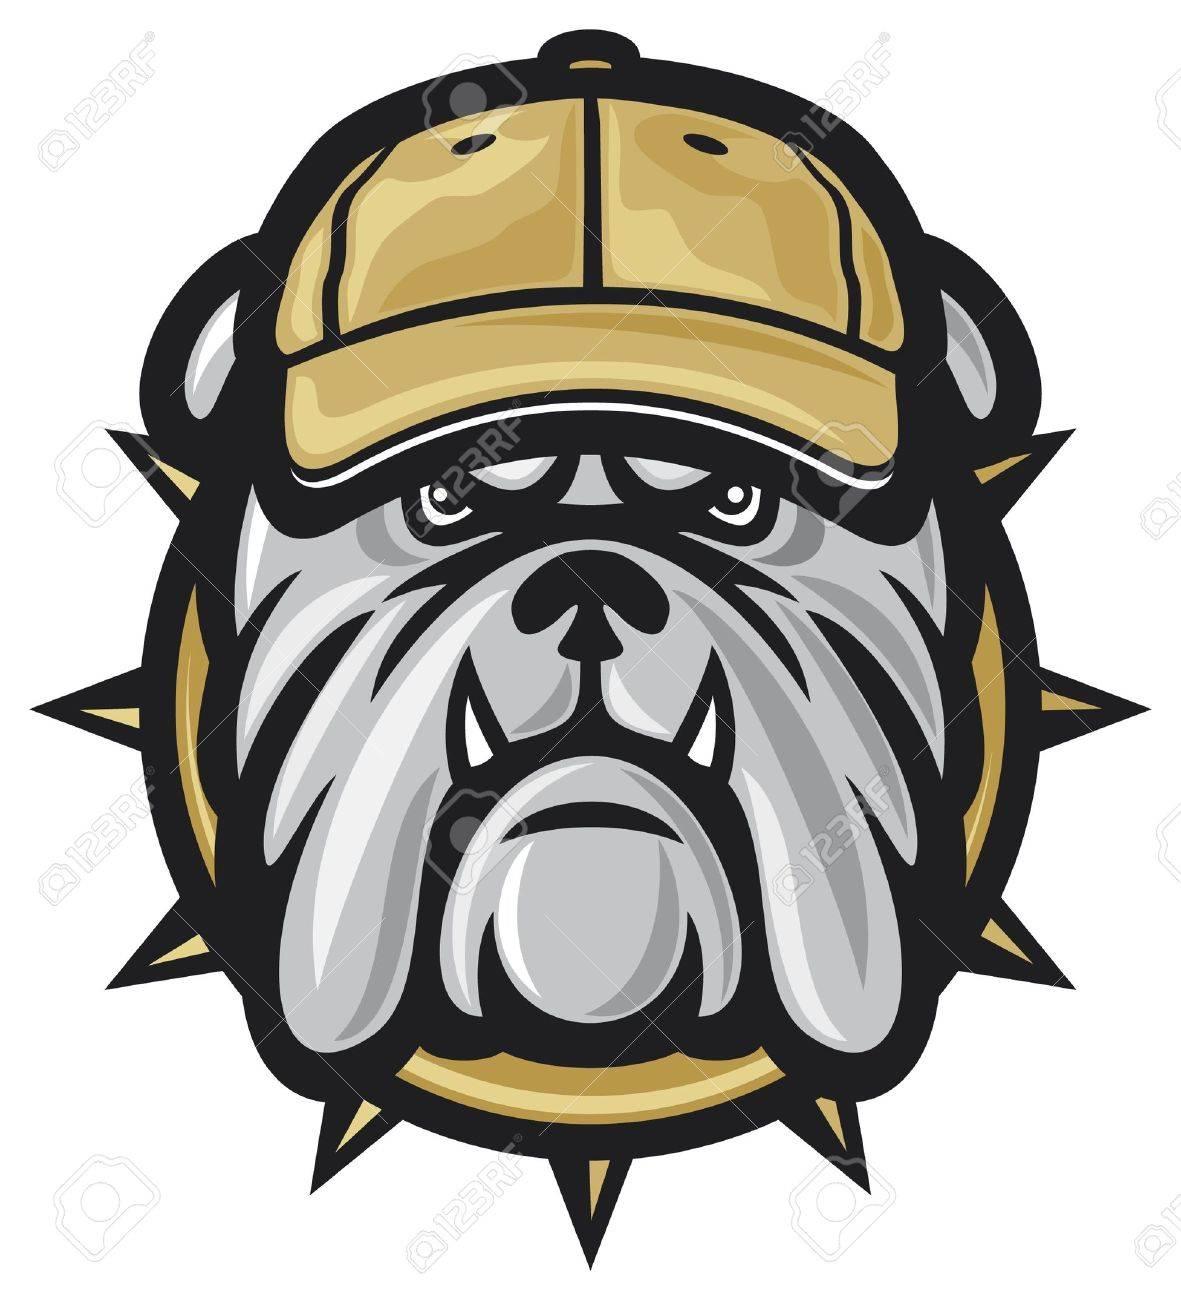 dog head and baseball cap